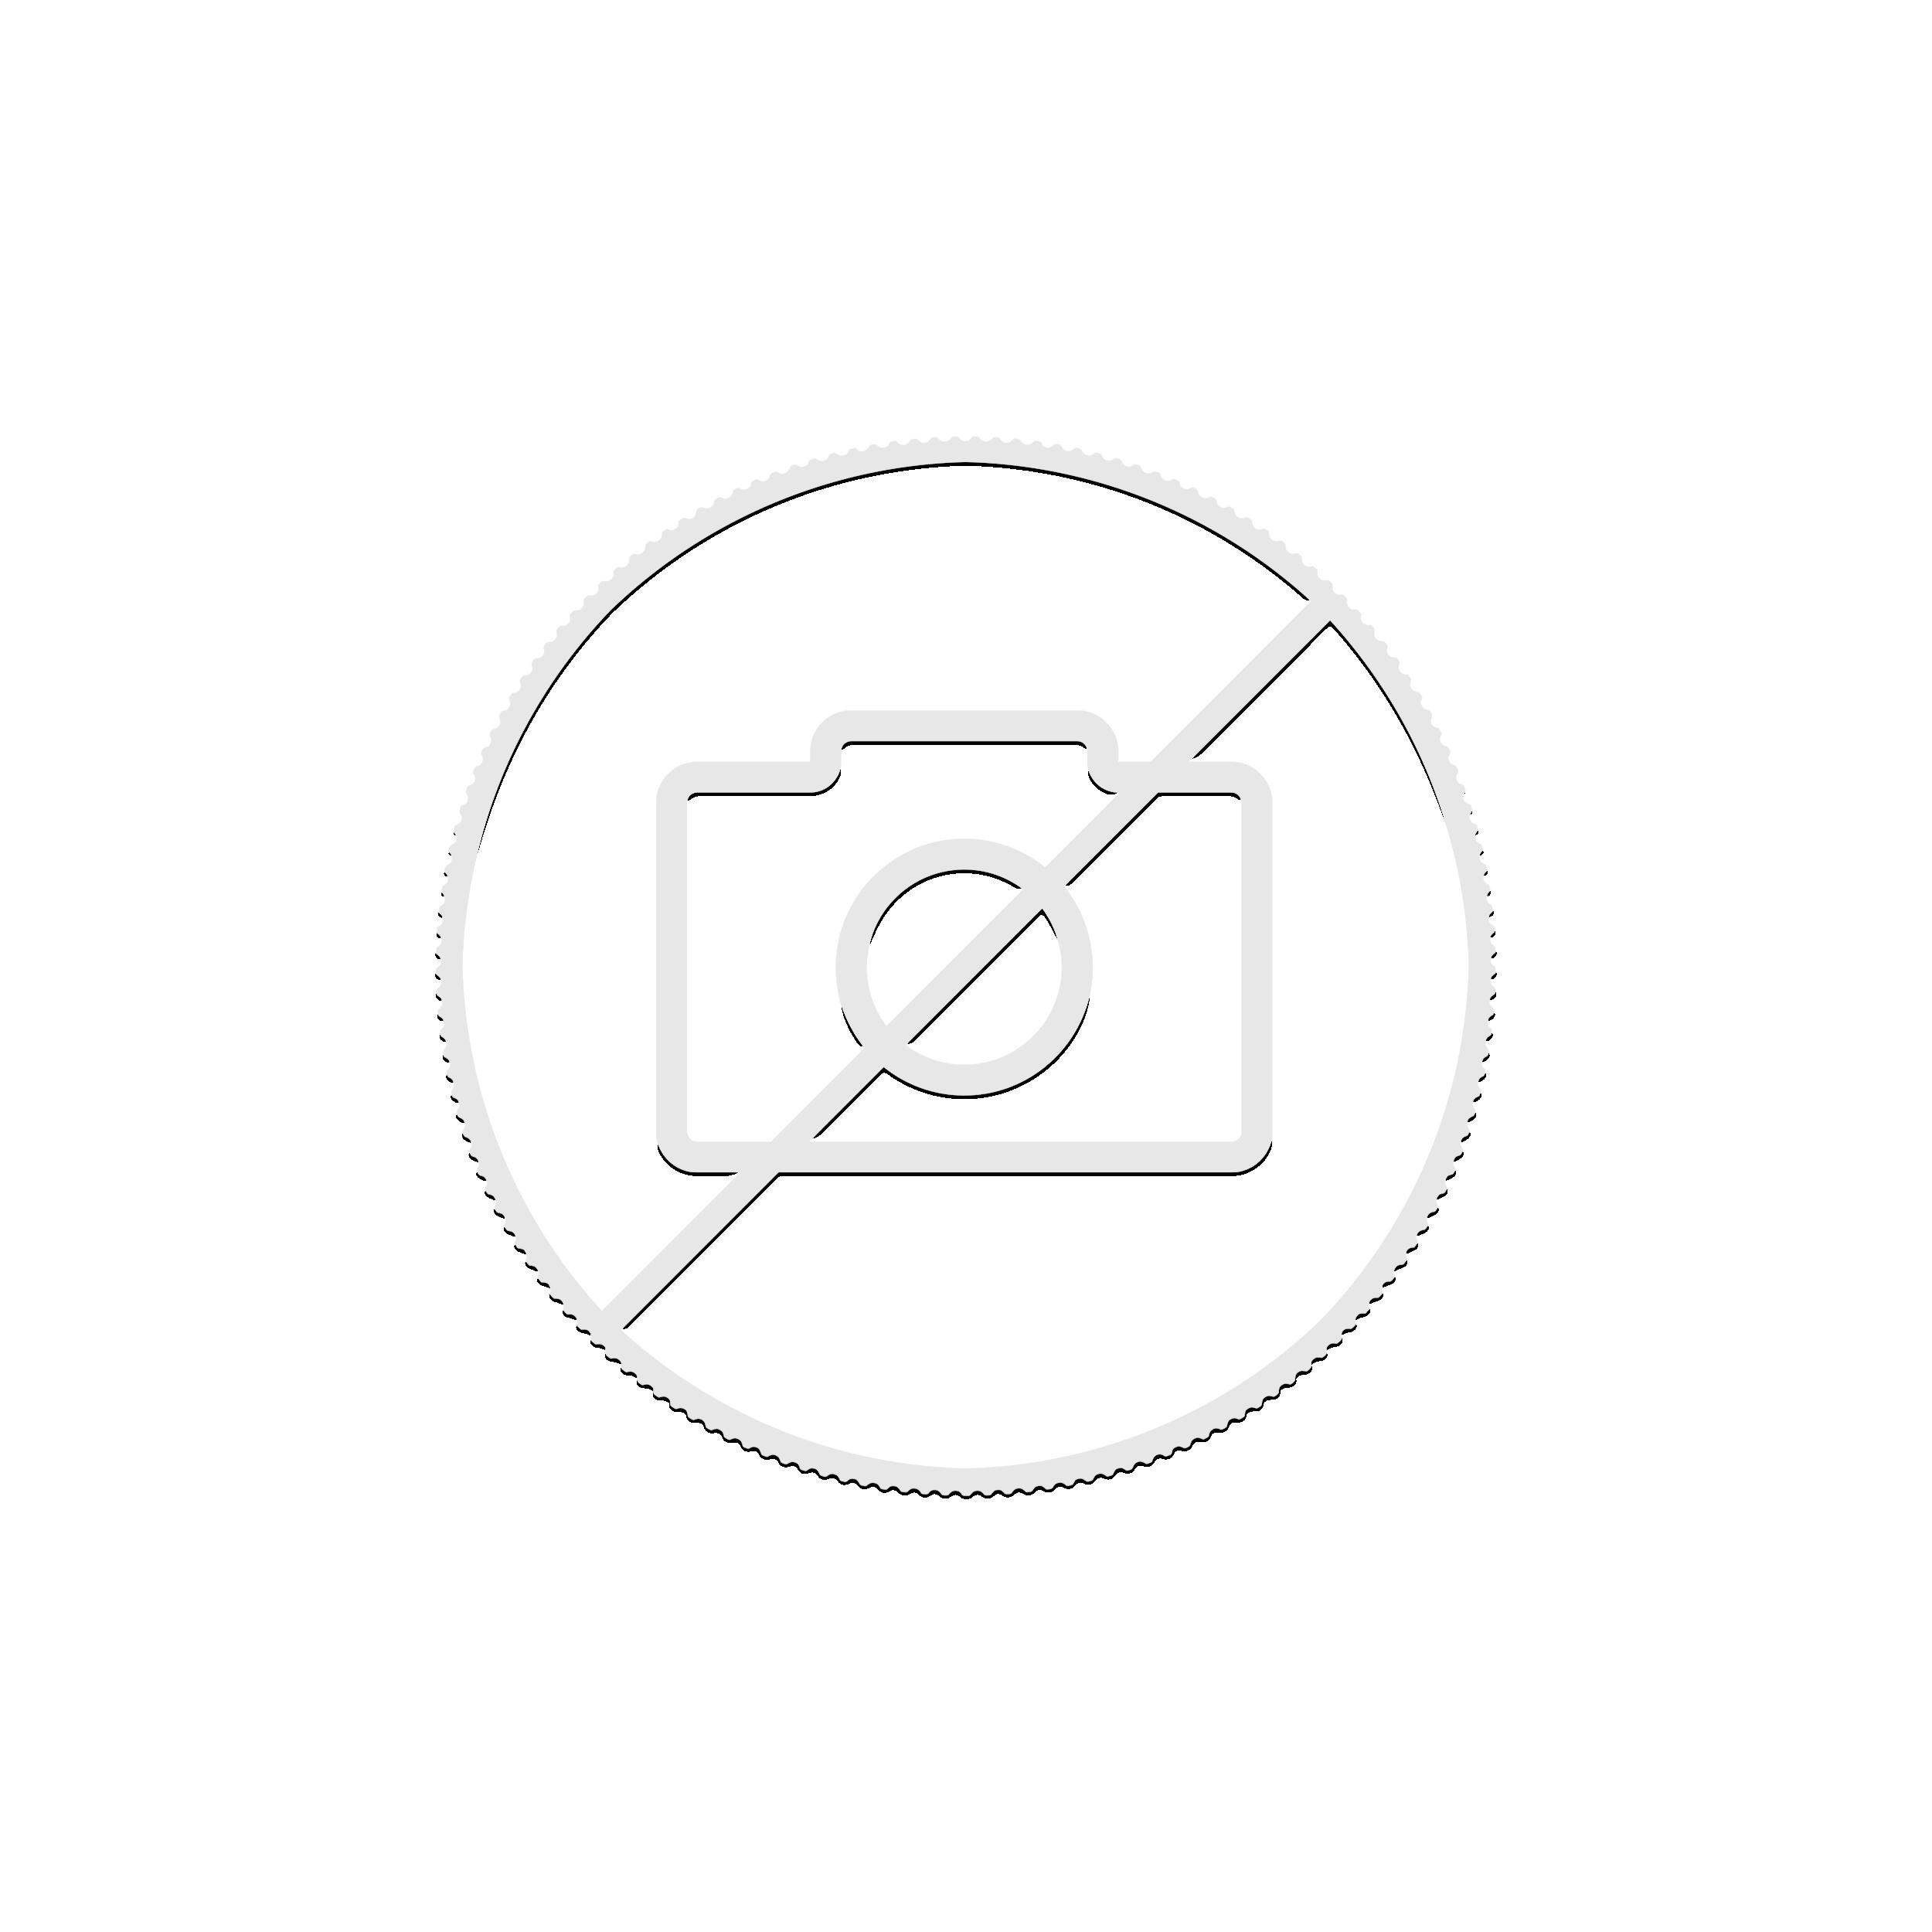 1 troy ounce zilveren munt Disney Mickey Mouse - ready set go proof 2020